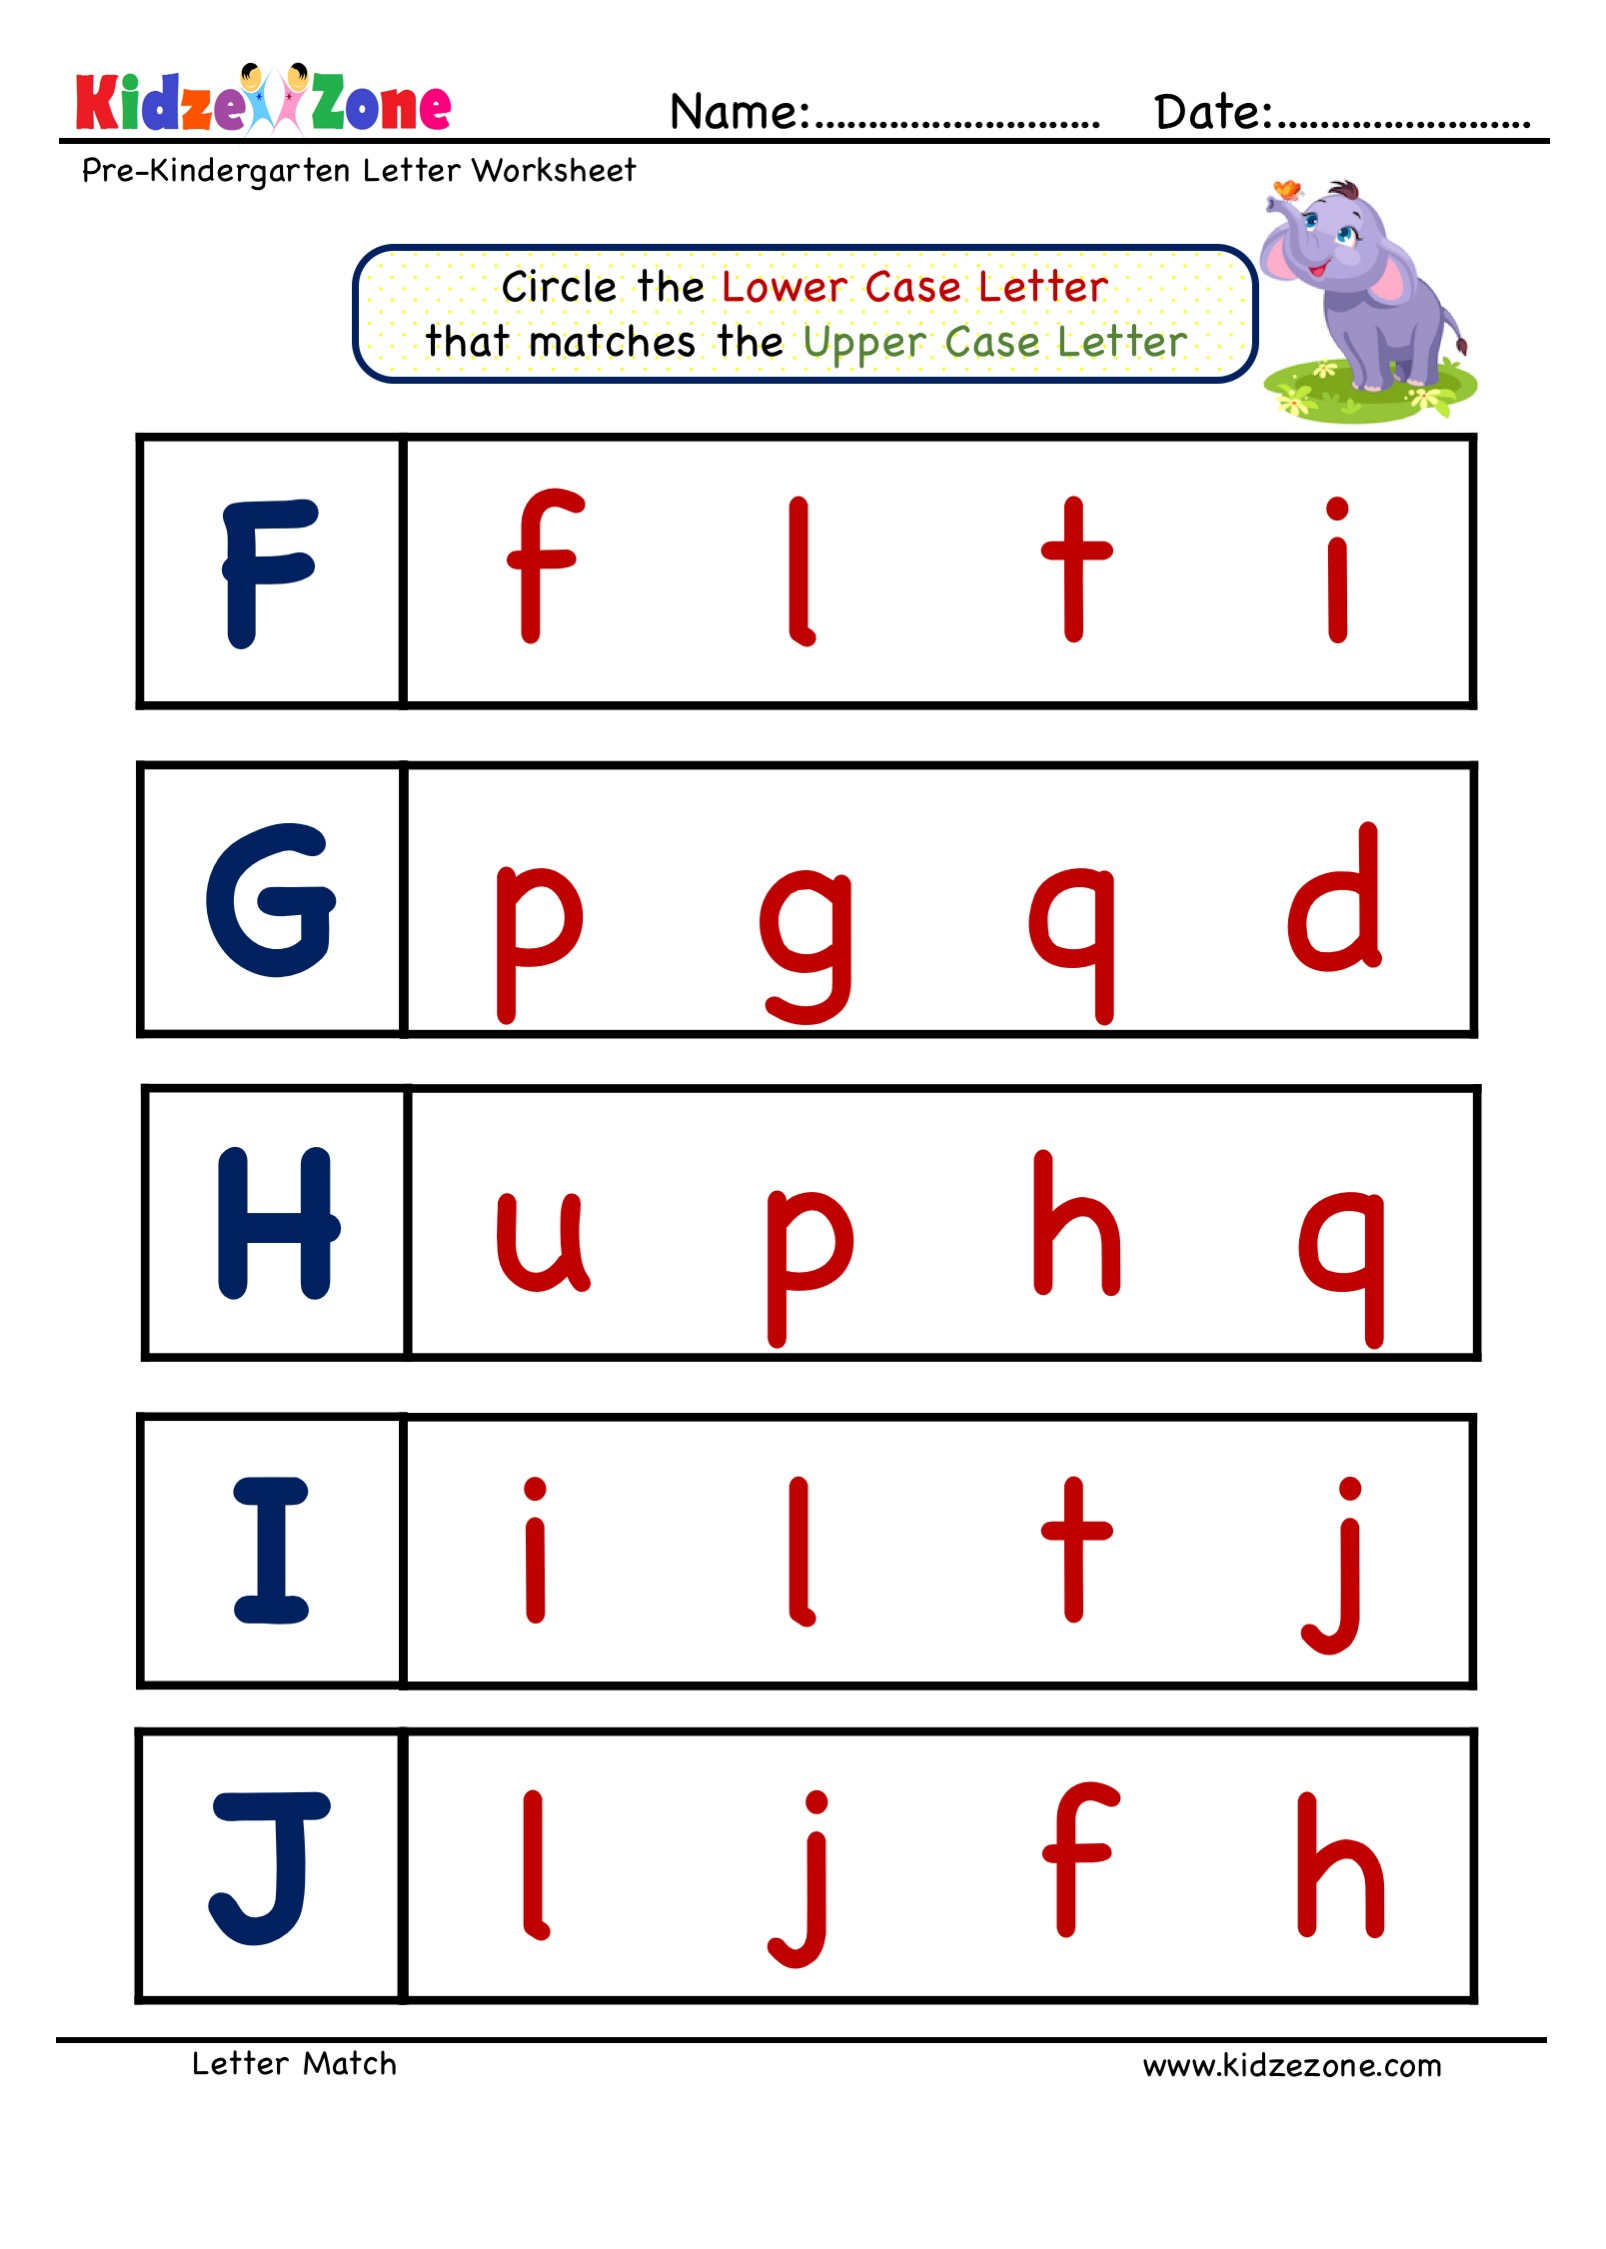 Preschool Letter Matching Upper Case To Lower Case Worksheet 1